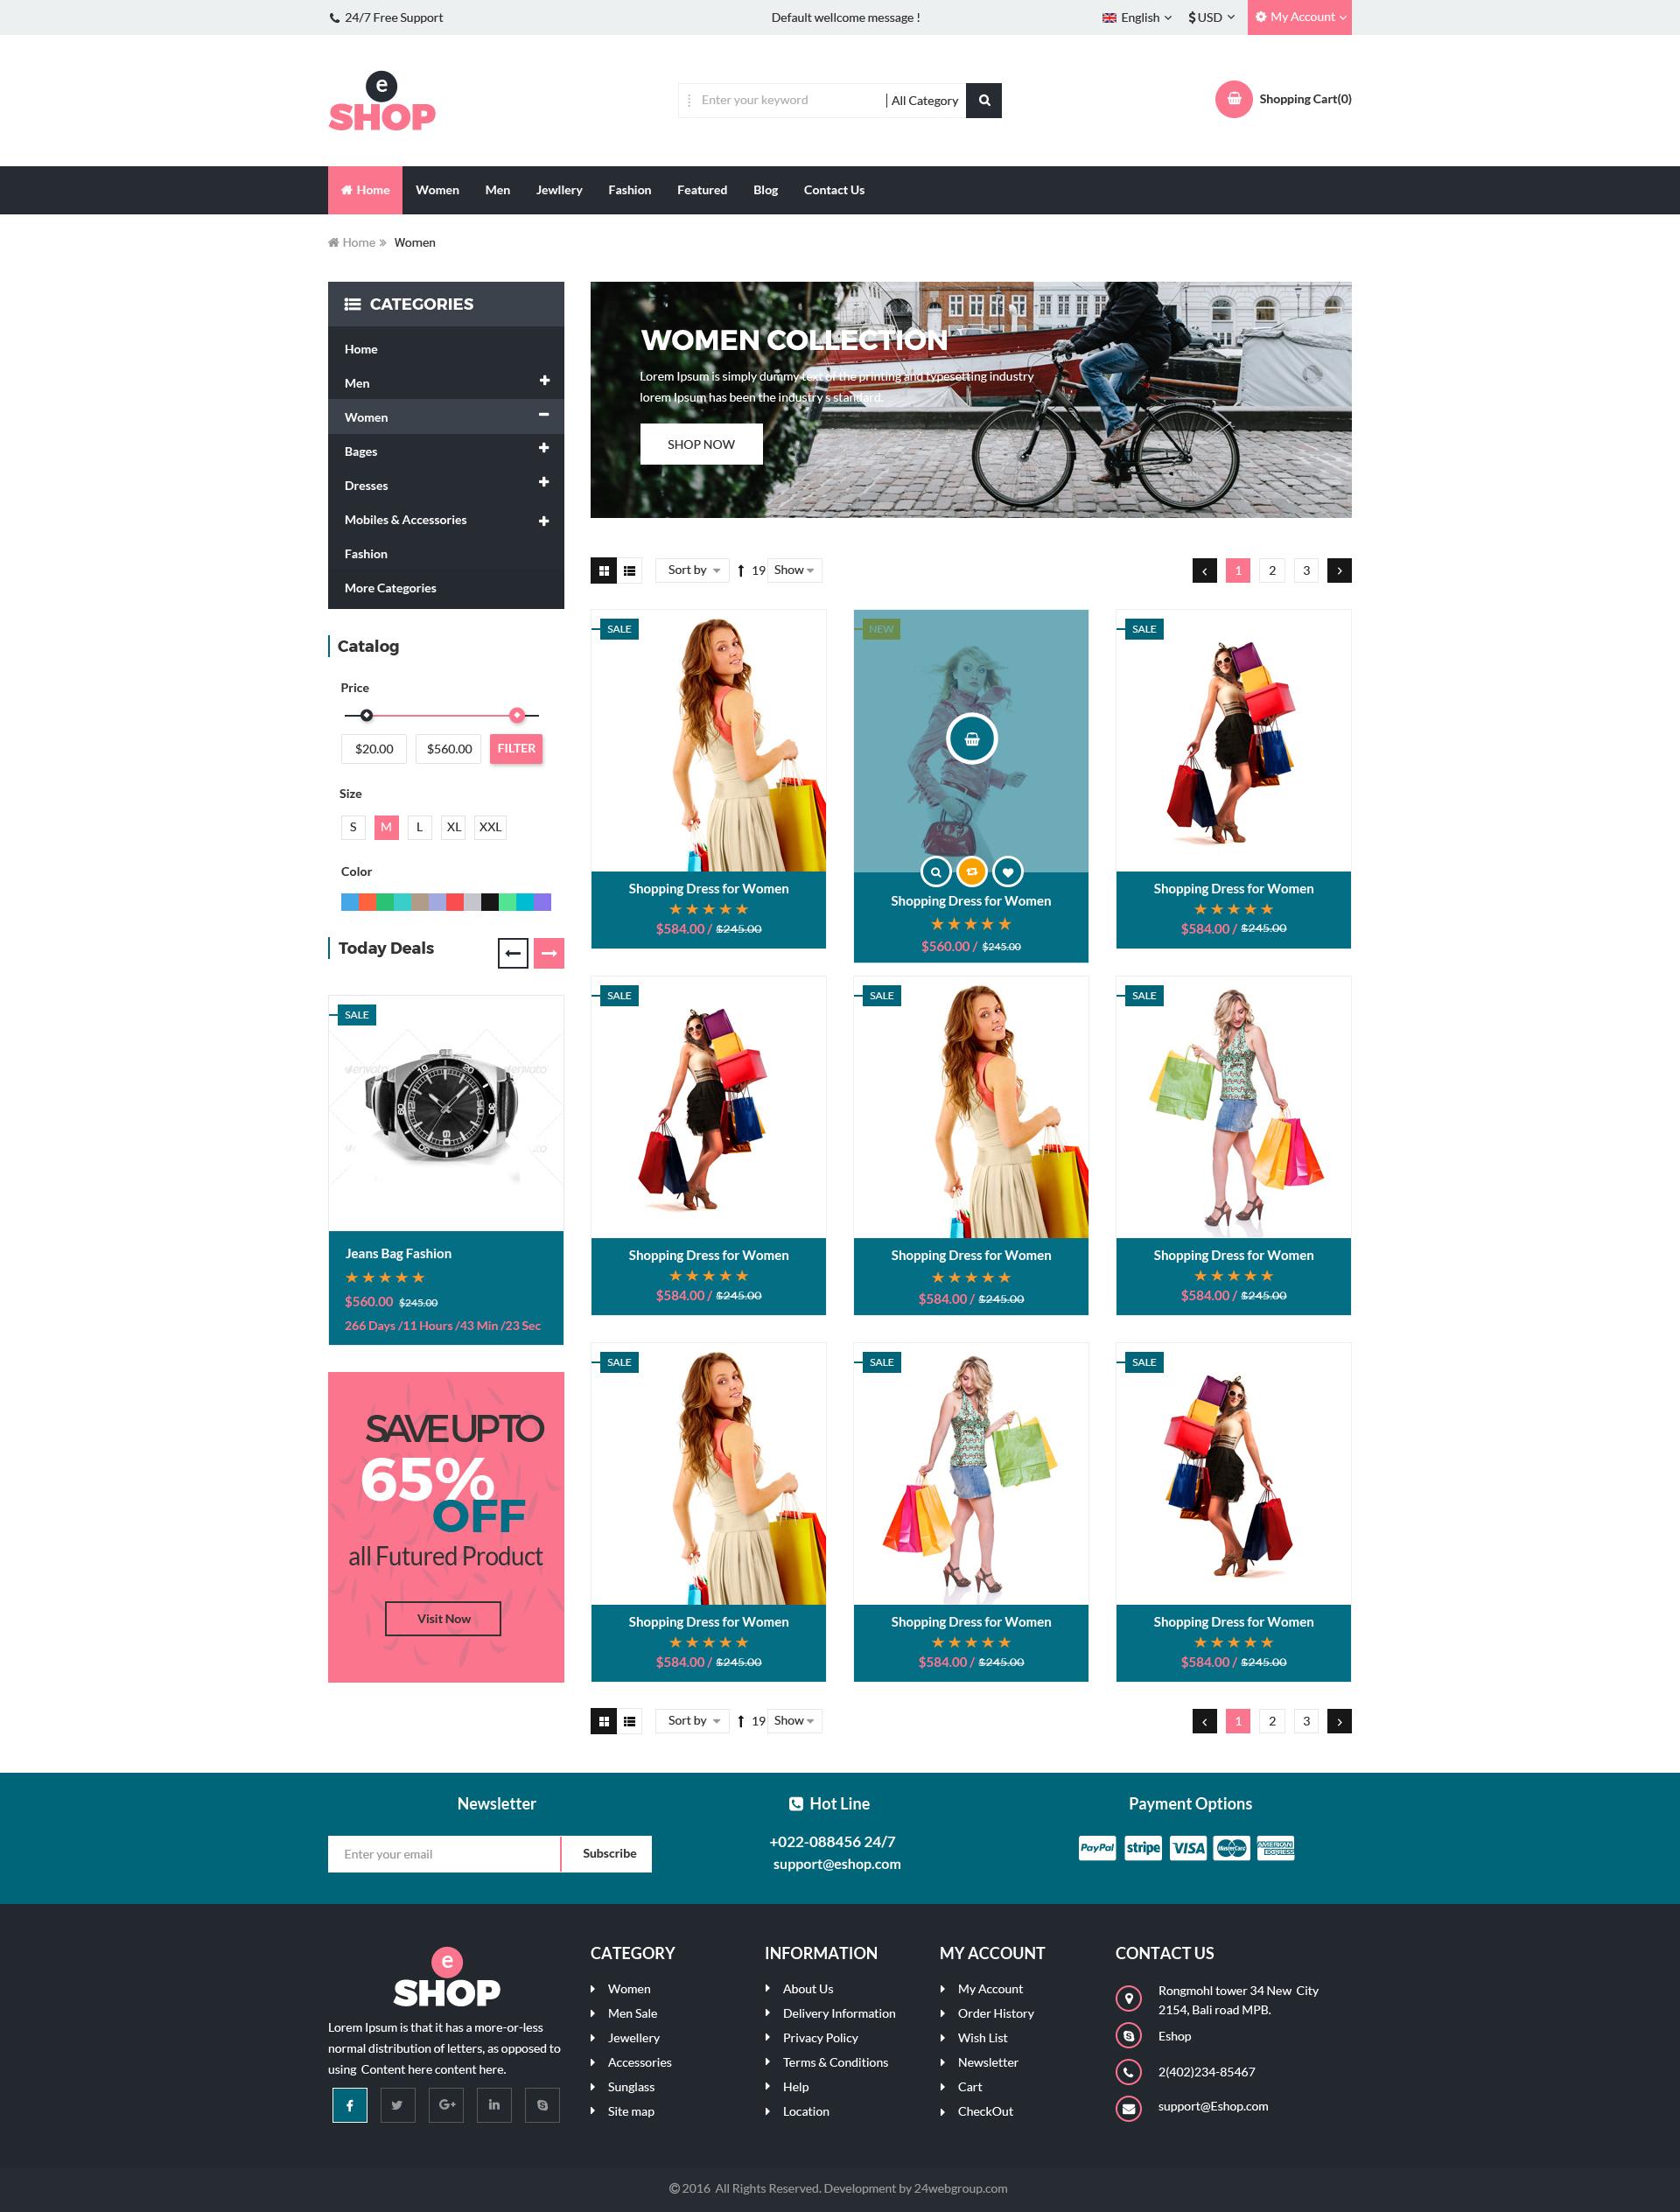 eShop-Multipurpose ecommerce PSD Template by 24webgroup | ThemeForest